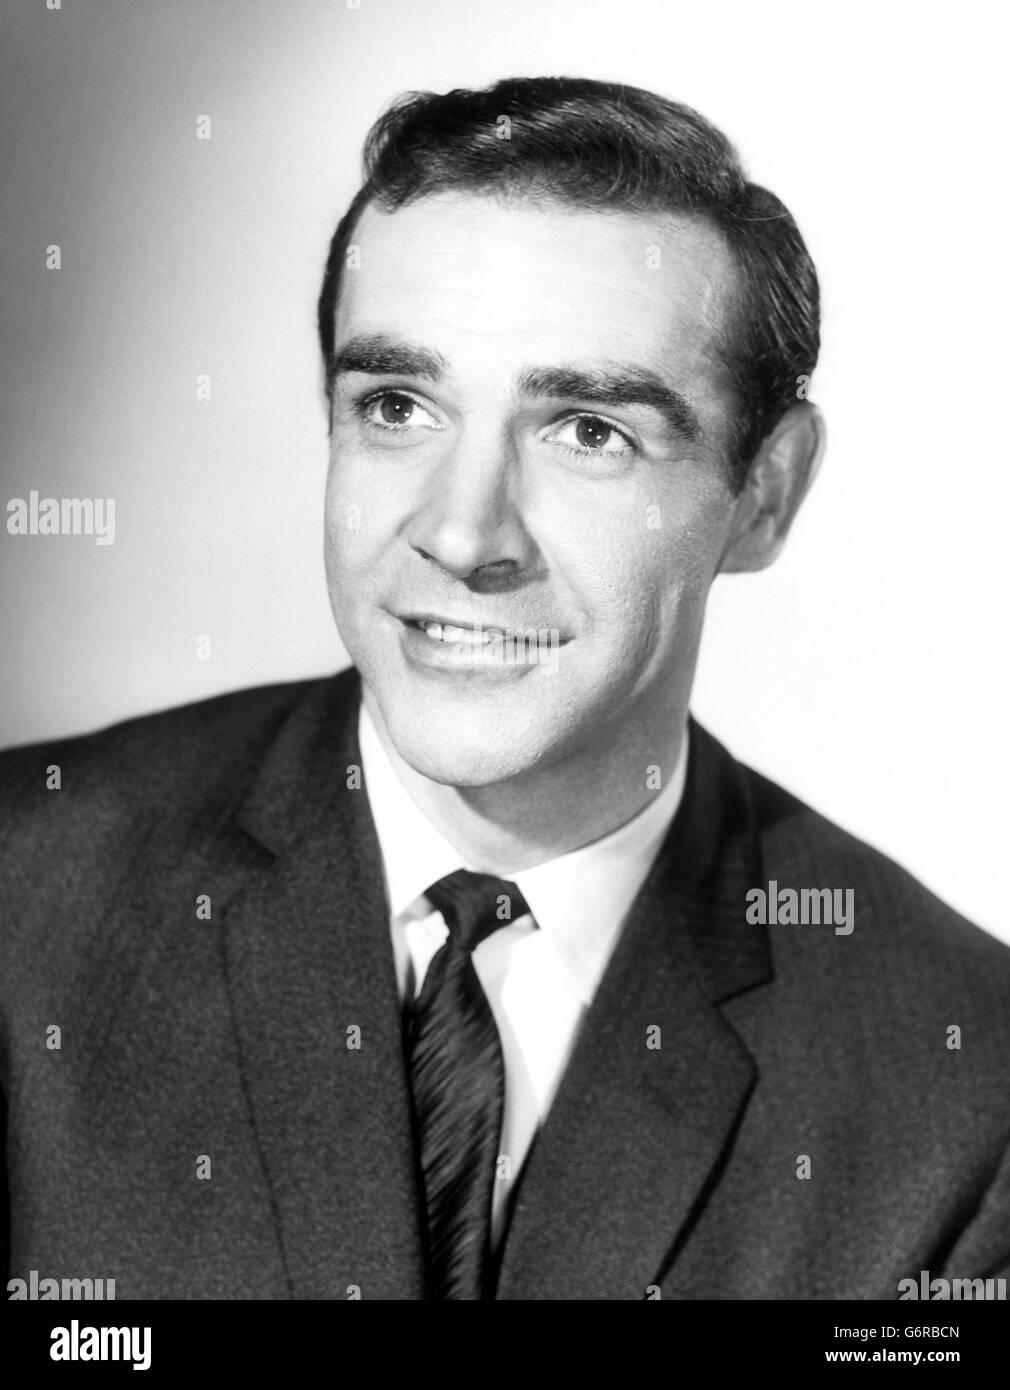 Film Sean Connery To Play James Bond Stock Photo Alamy